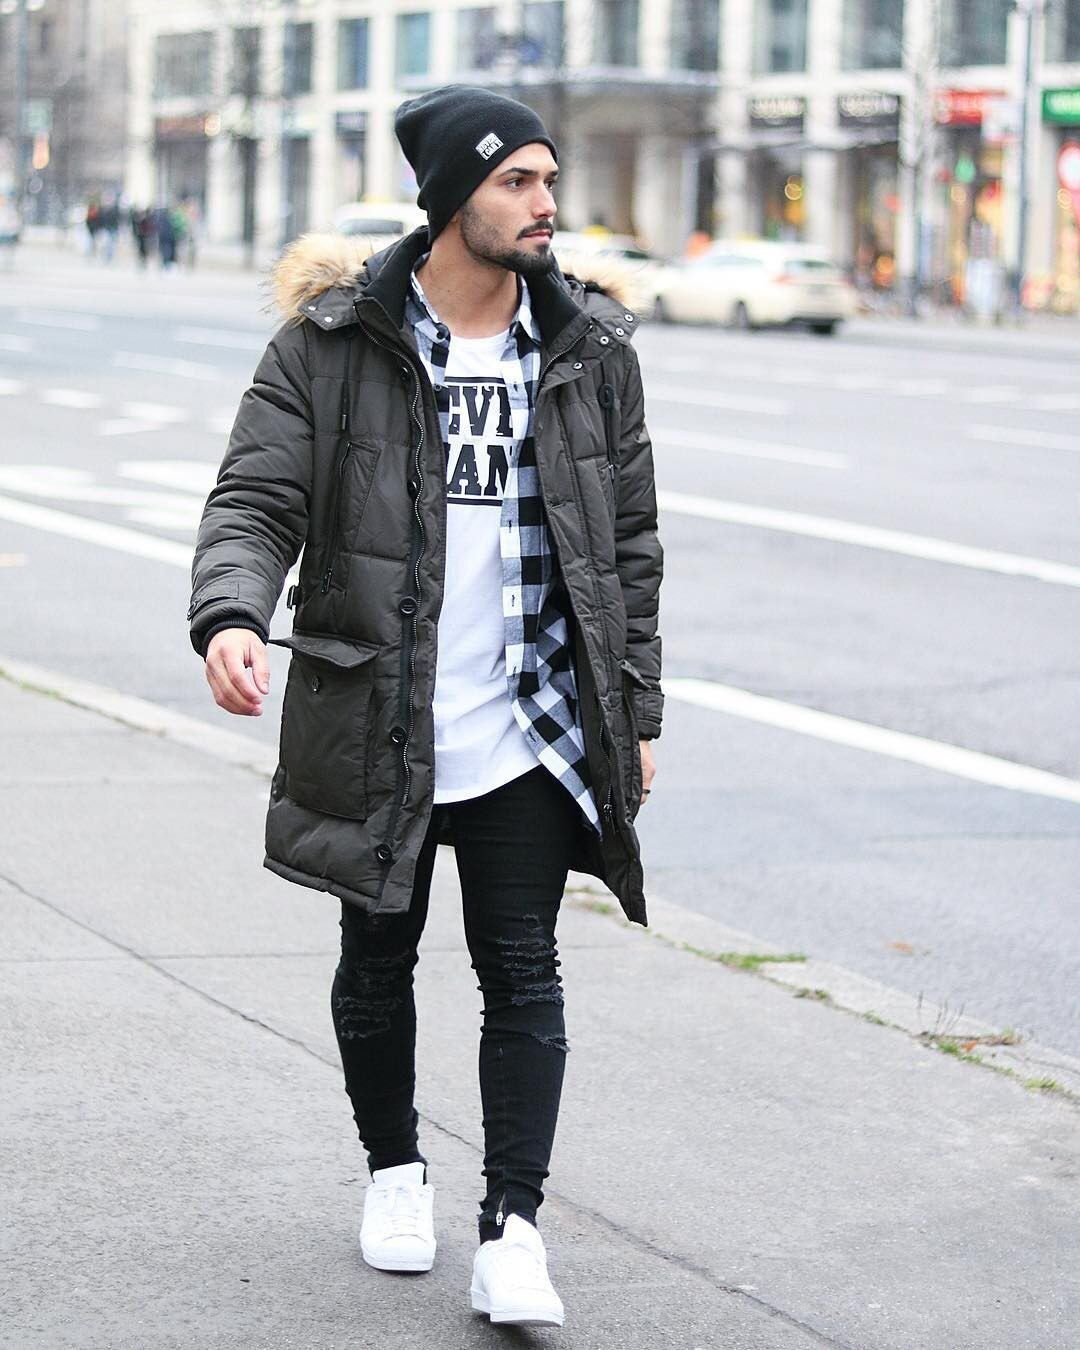 c6f77b1fc71b 48 Fabulous Fall Fashion Trends Clothing for Men